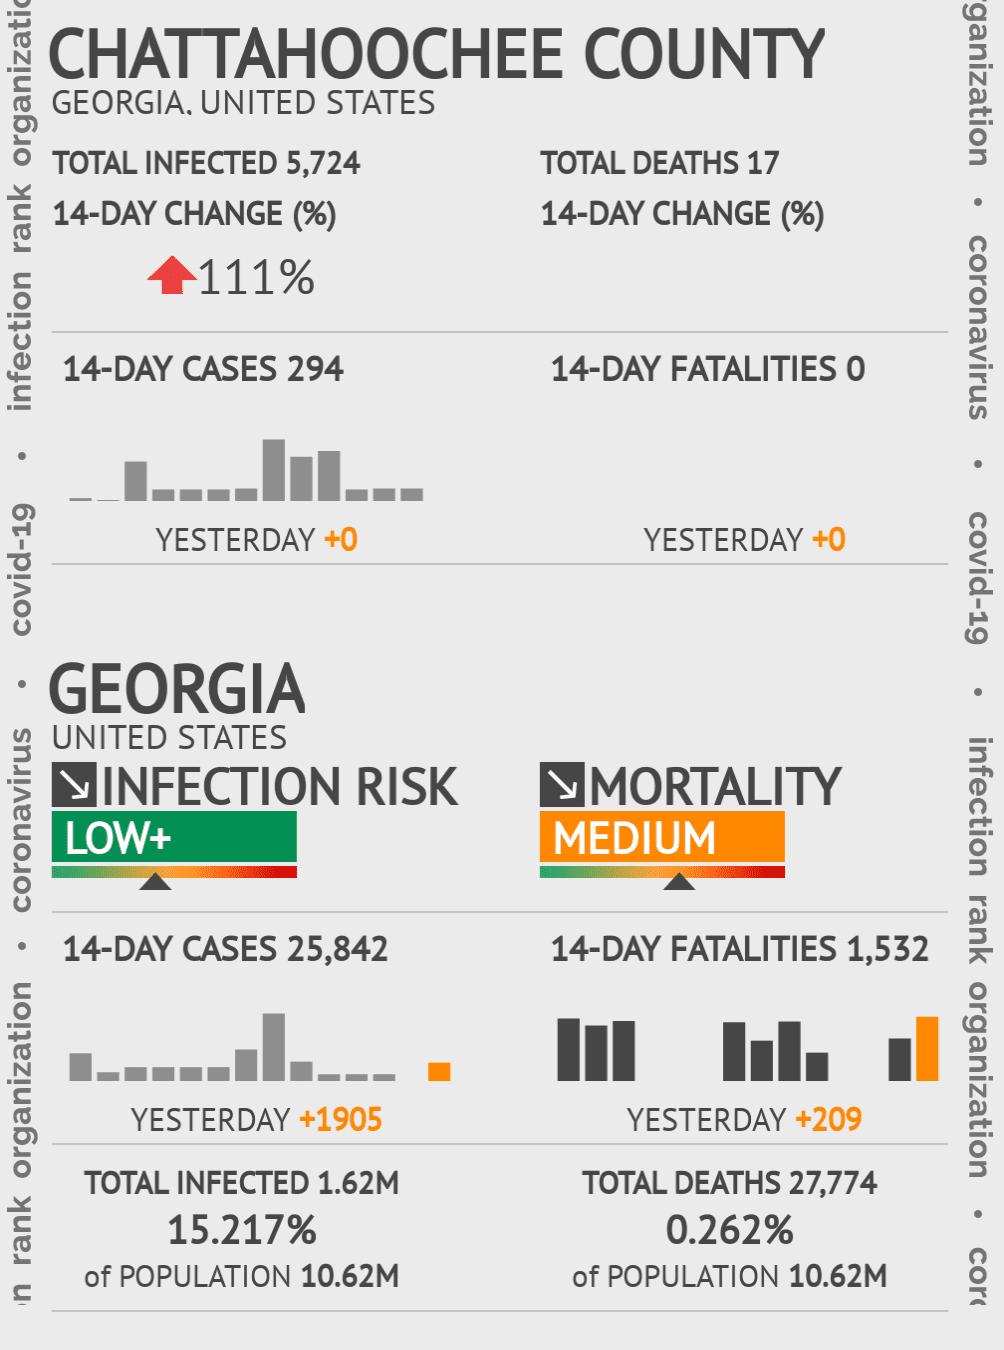 Chattahoochee County Coronavirus Covid-19 Risk of Infection on November 24, 2020